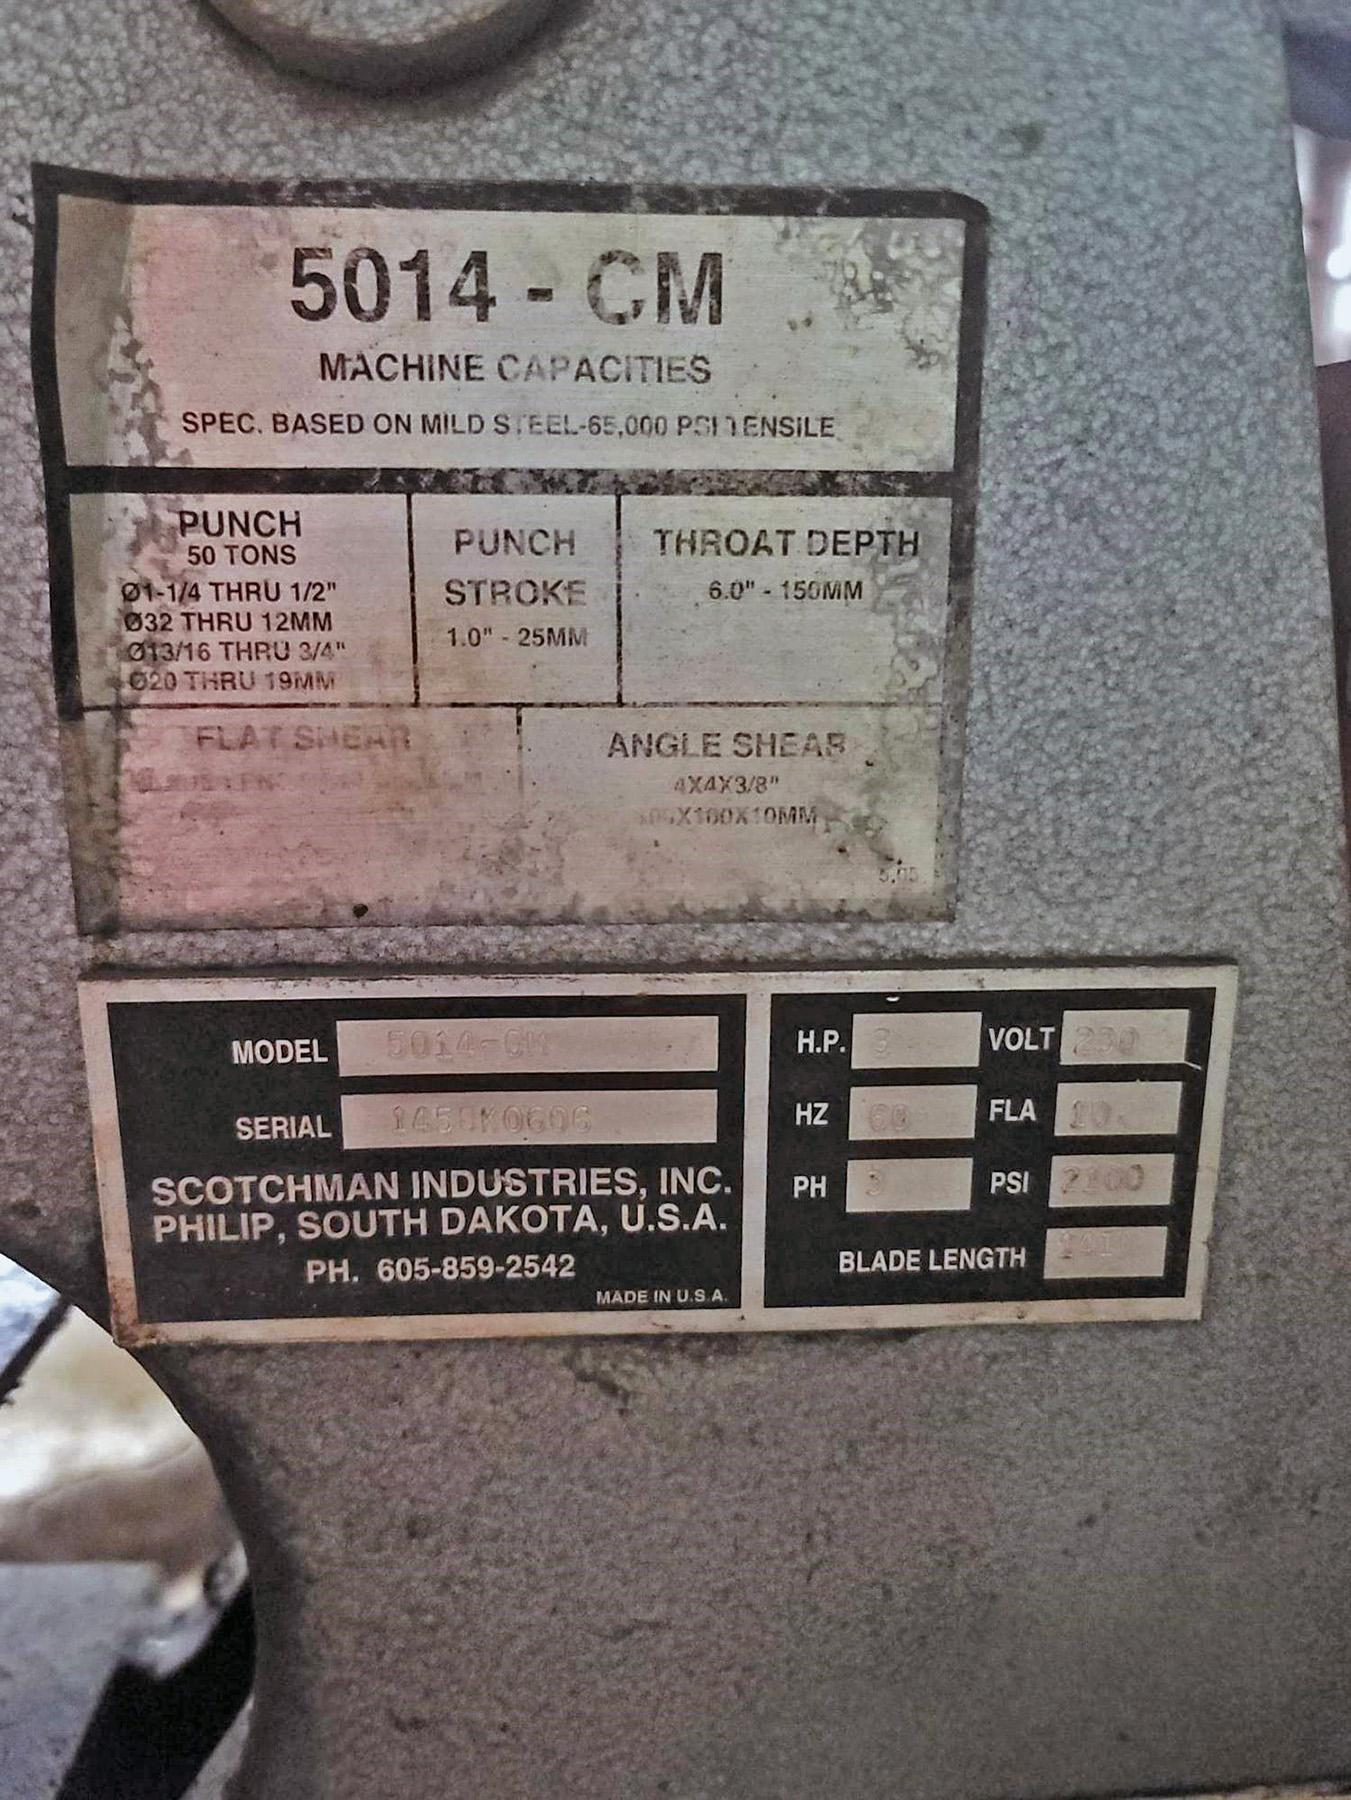 USED, 50 TON SCOTCHMAN MODEL 5014-CM IRONWORKER